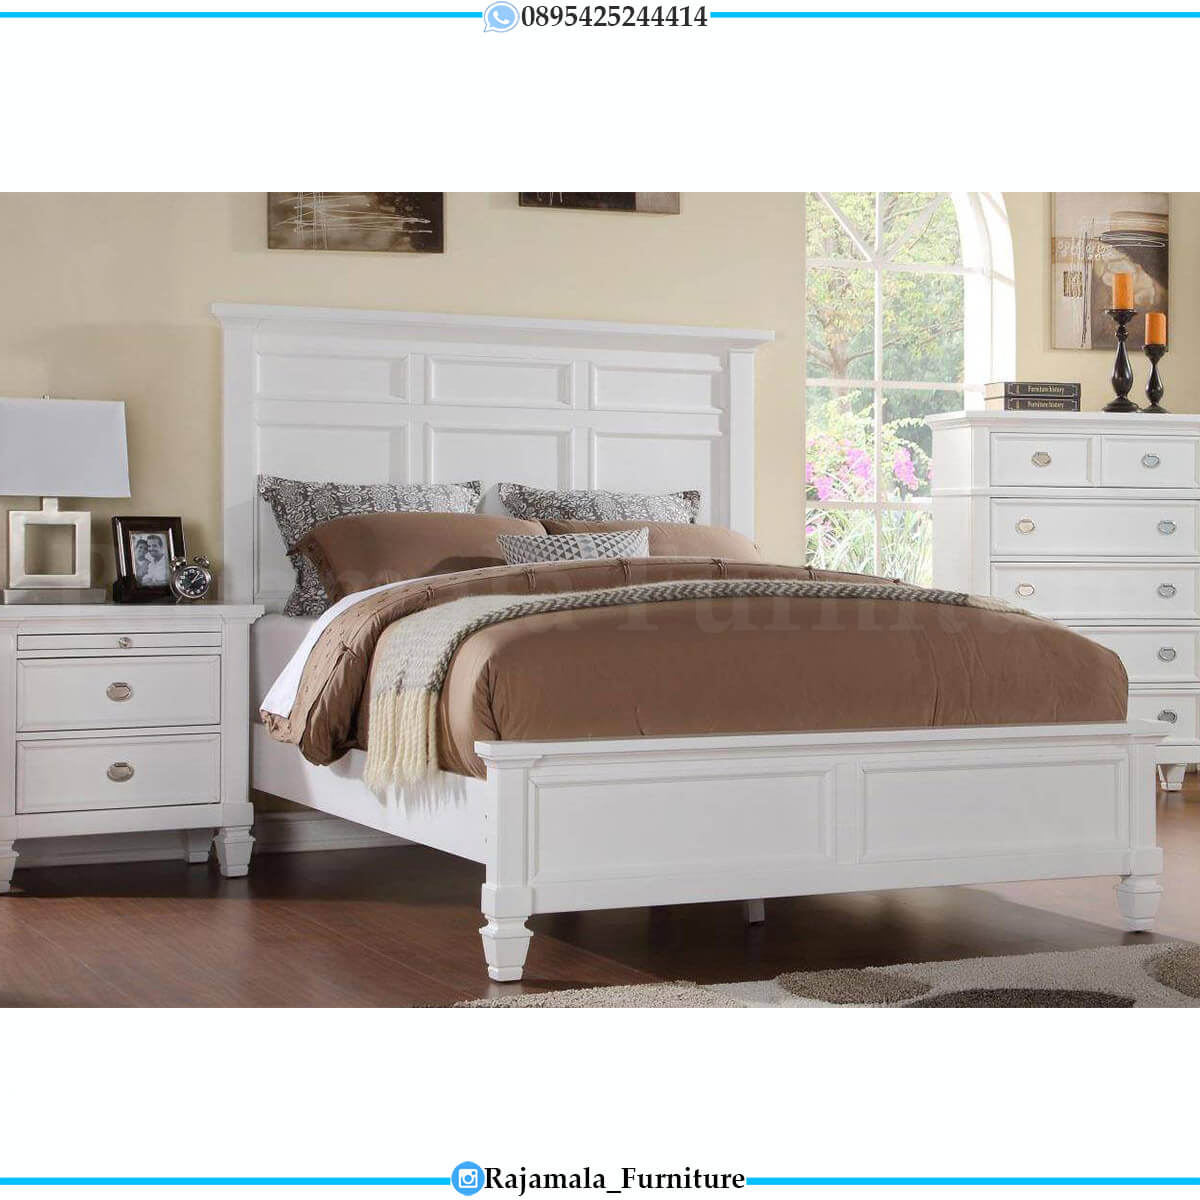 Harga Tempat Tidur Minimalis Putih Duco Luxury Set Jepara RM-0641